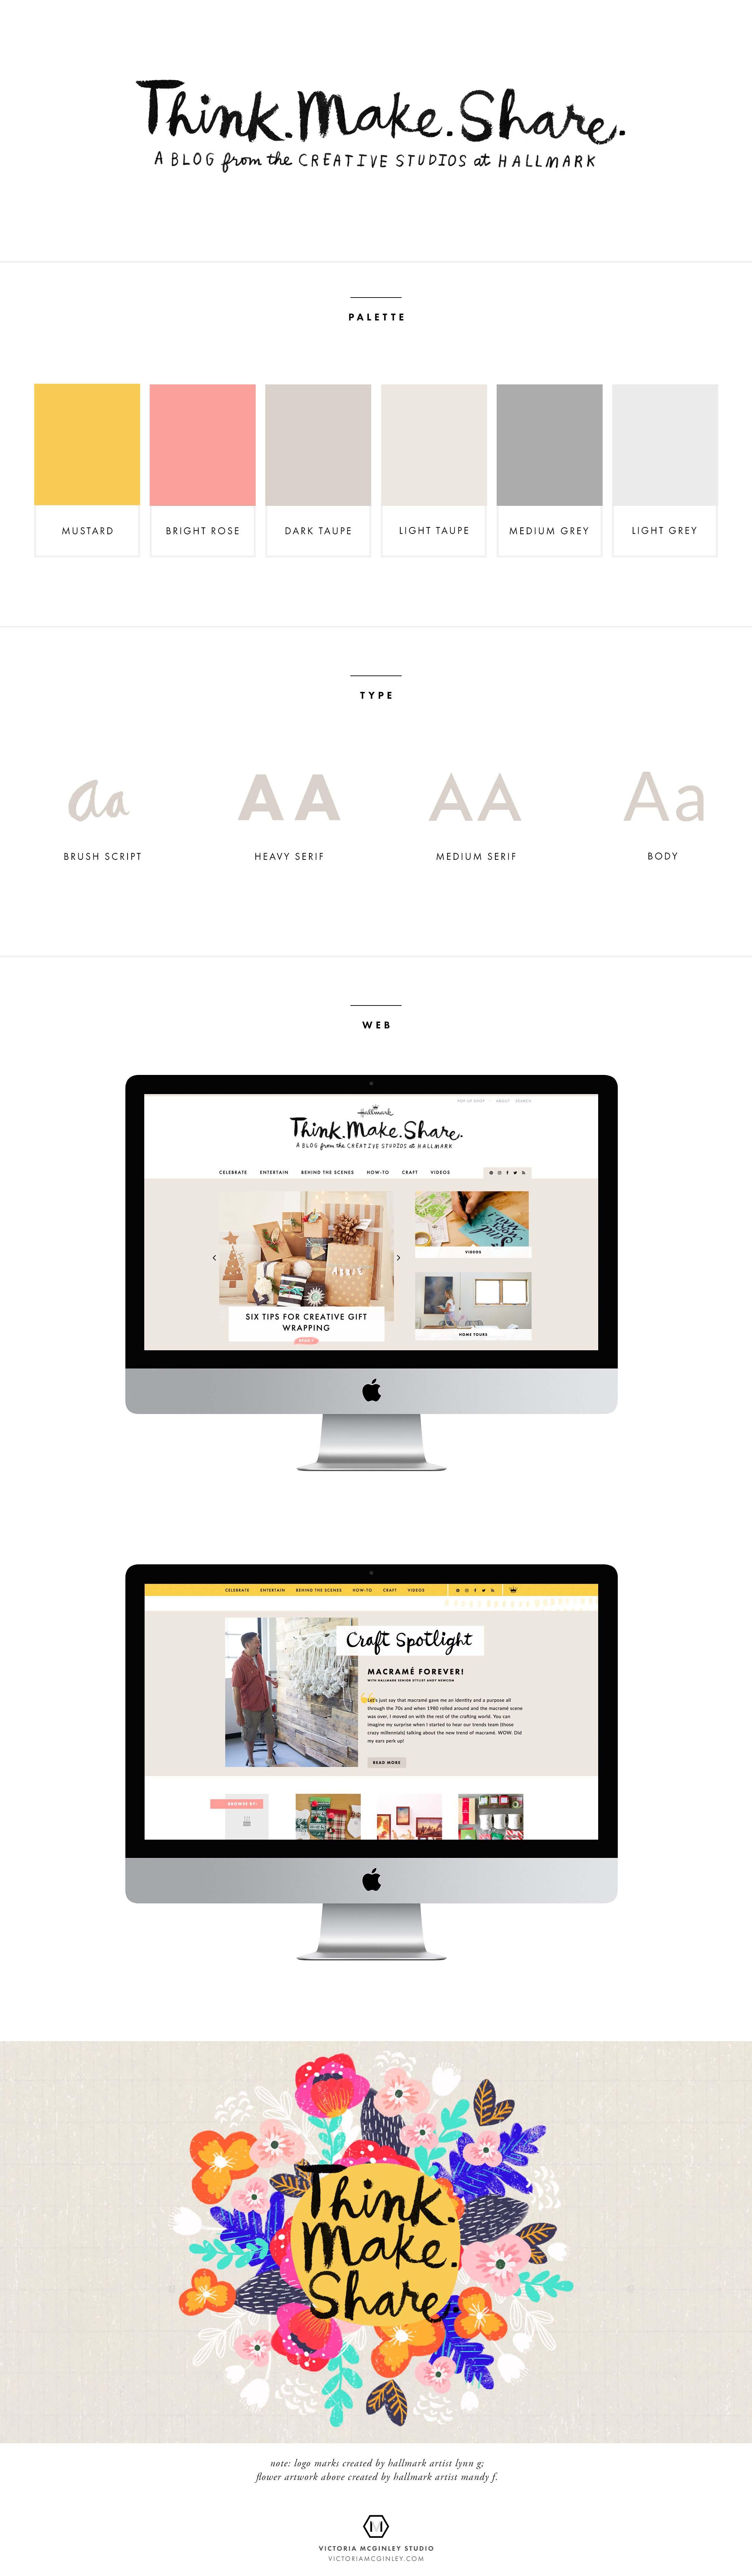 Think Make Share blog by Hallmark | web design by @victoriamstudio